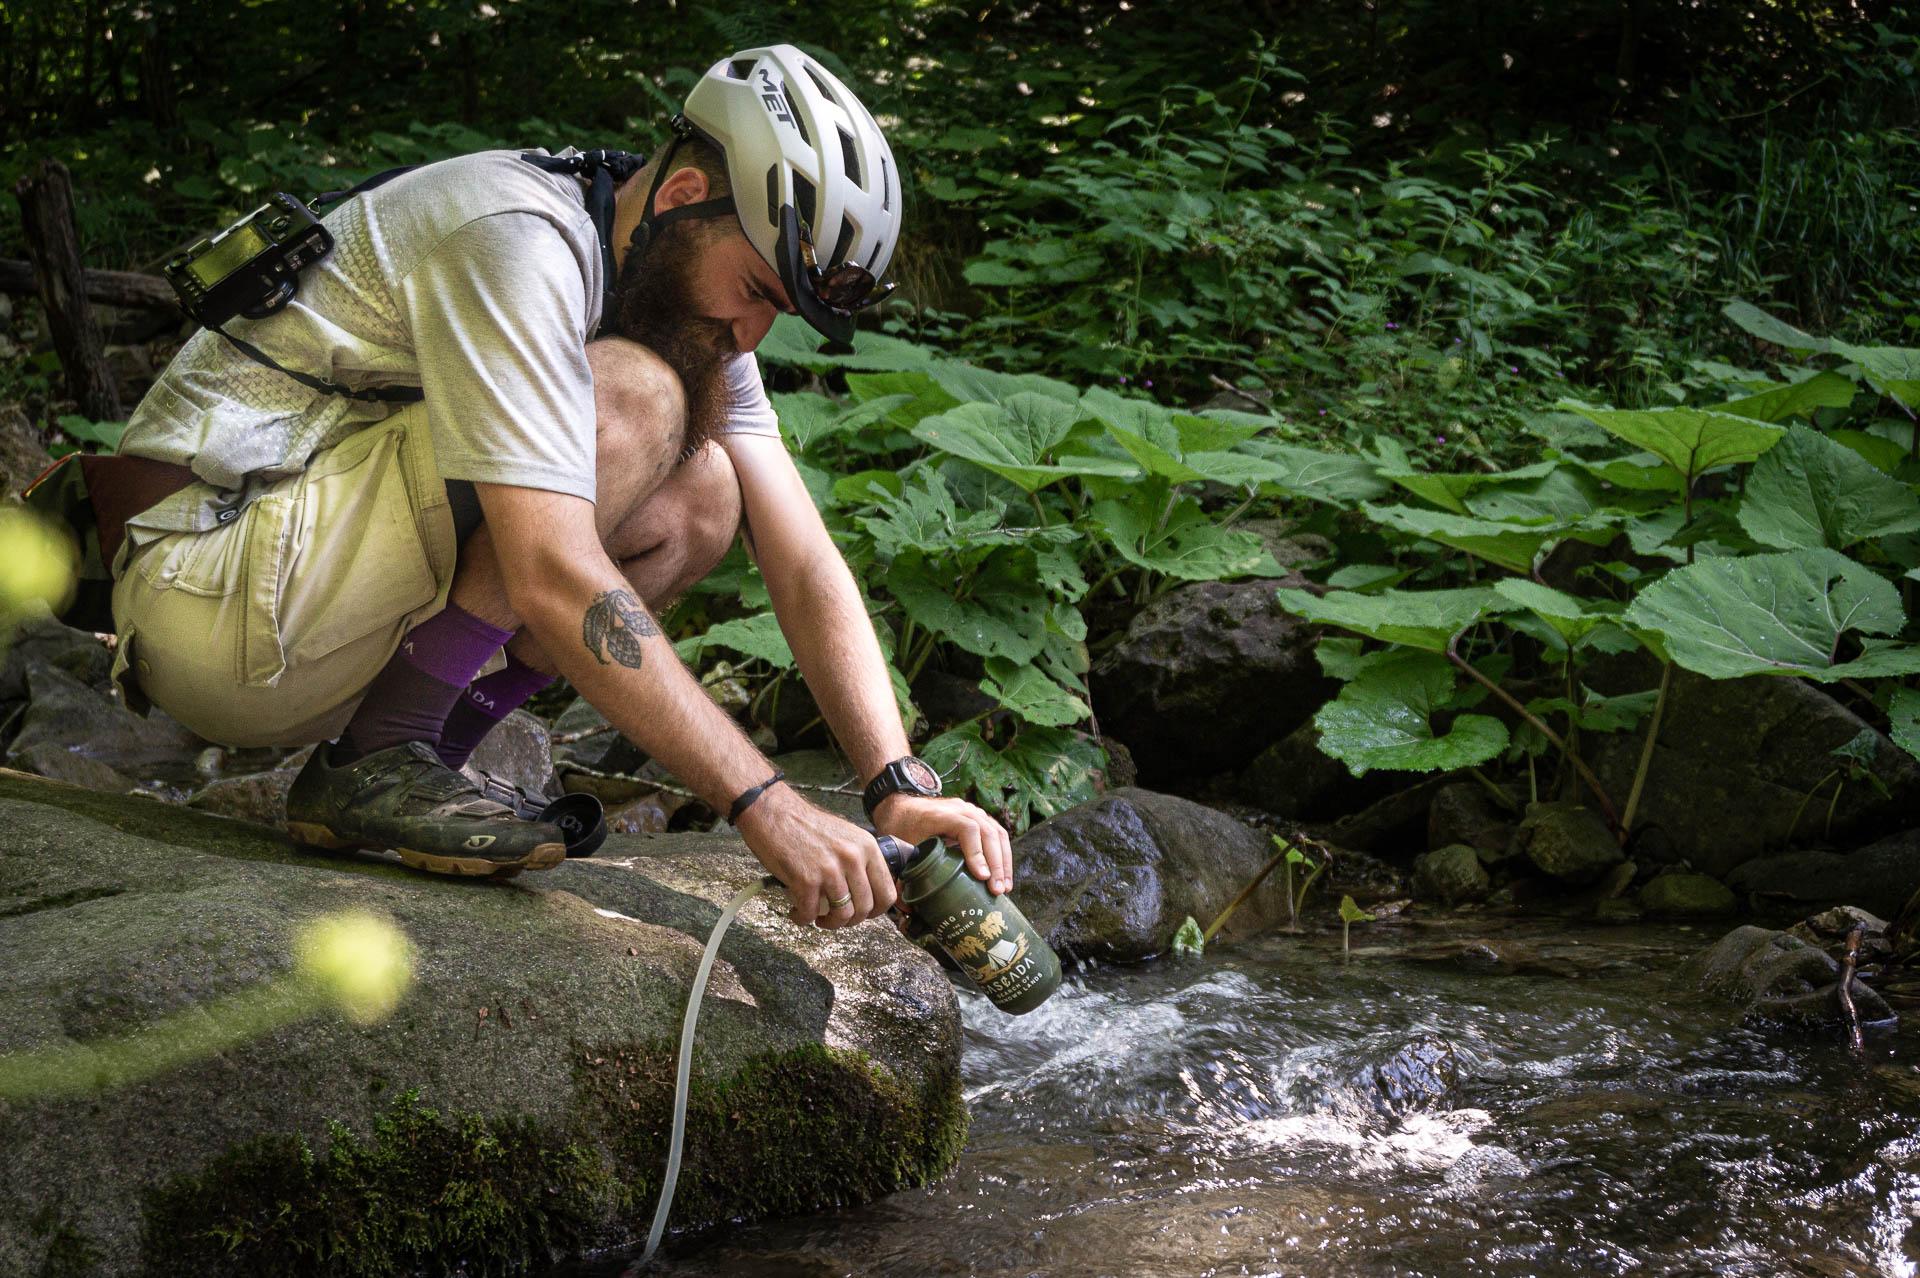 bikepacking-garfagnana (24 di 31)